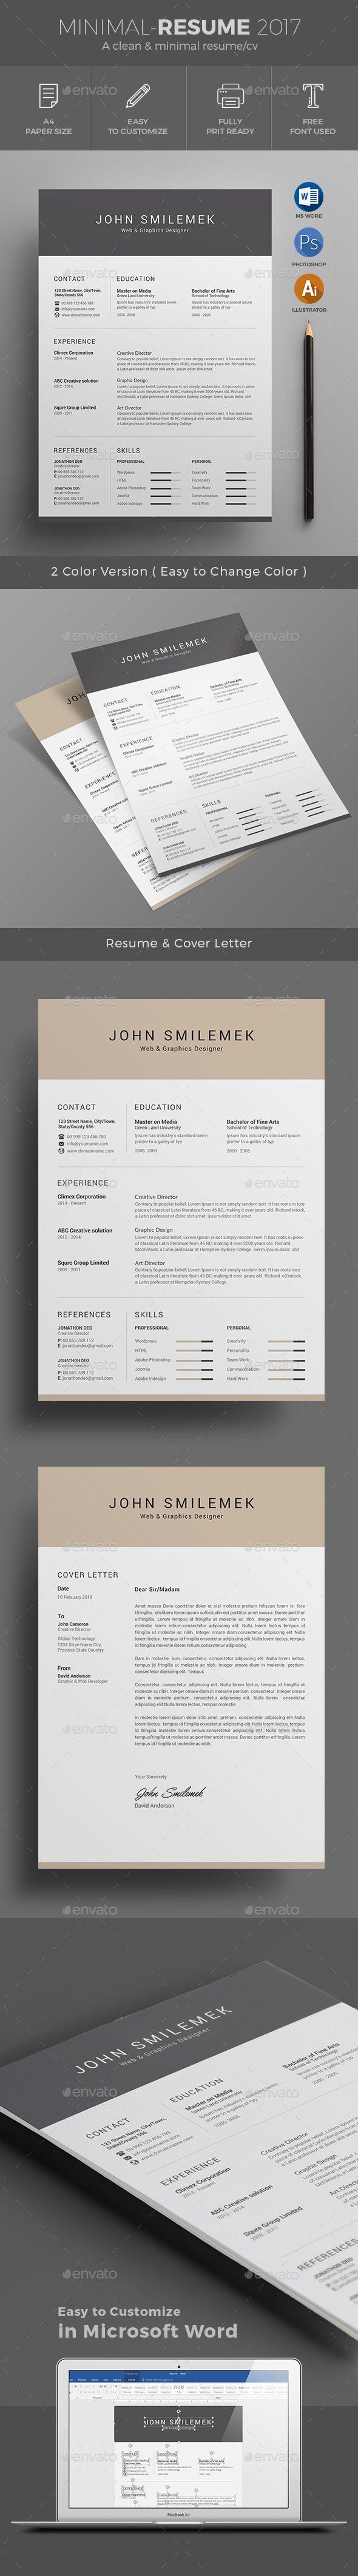 Resume Resume Design Template Resume Template Best Resume Template